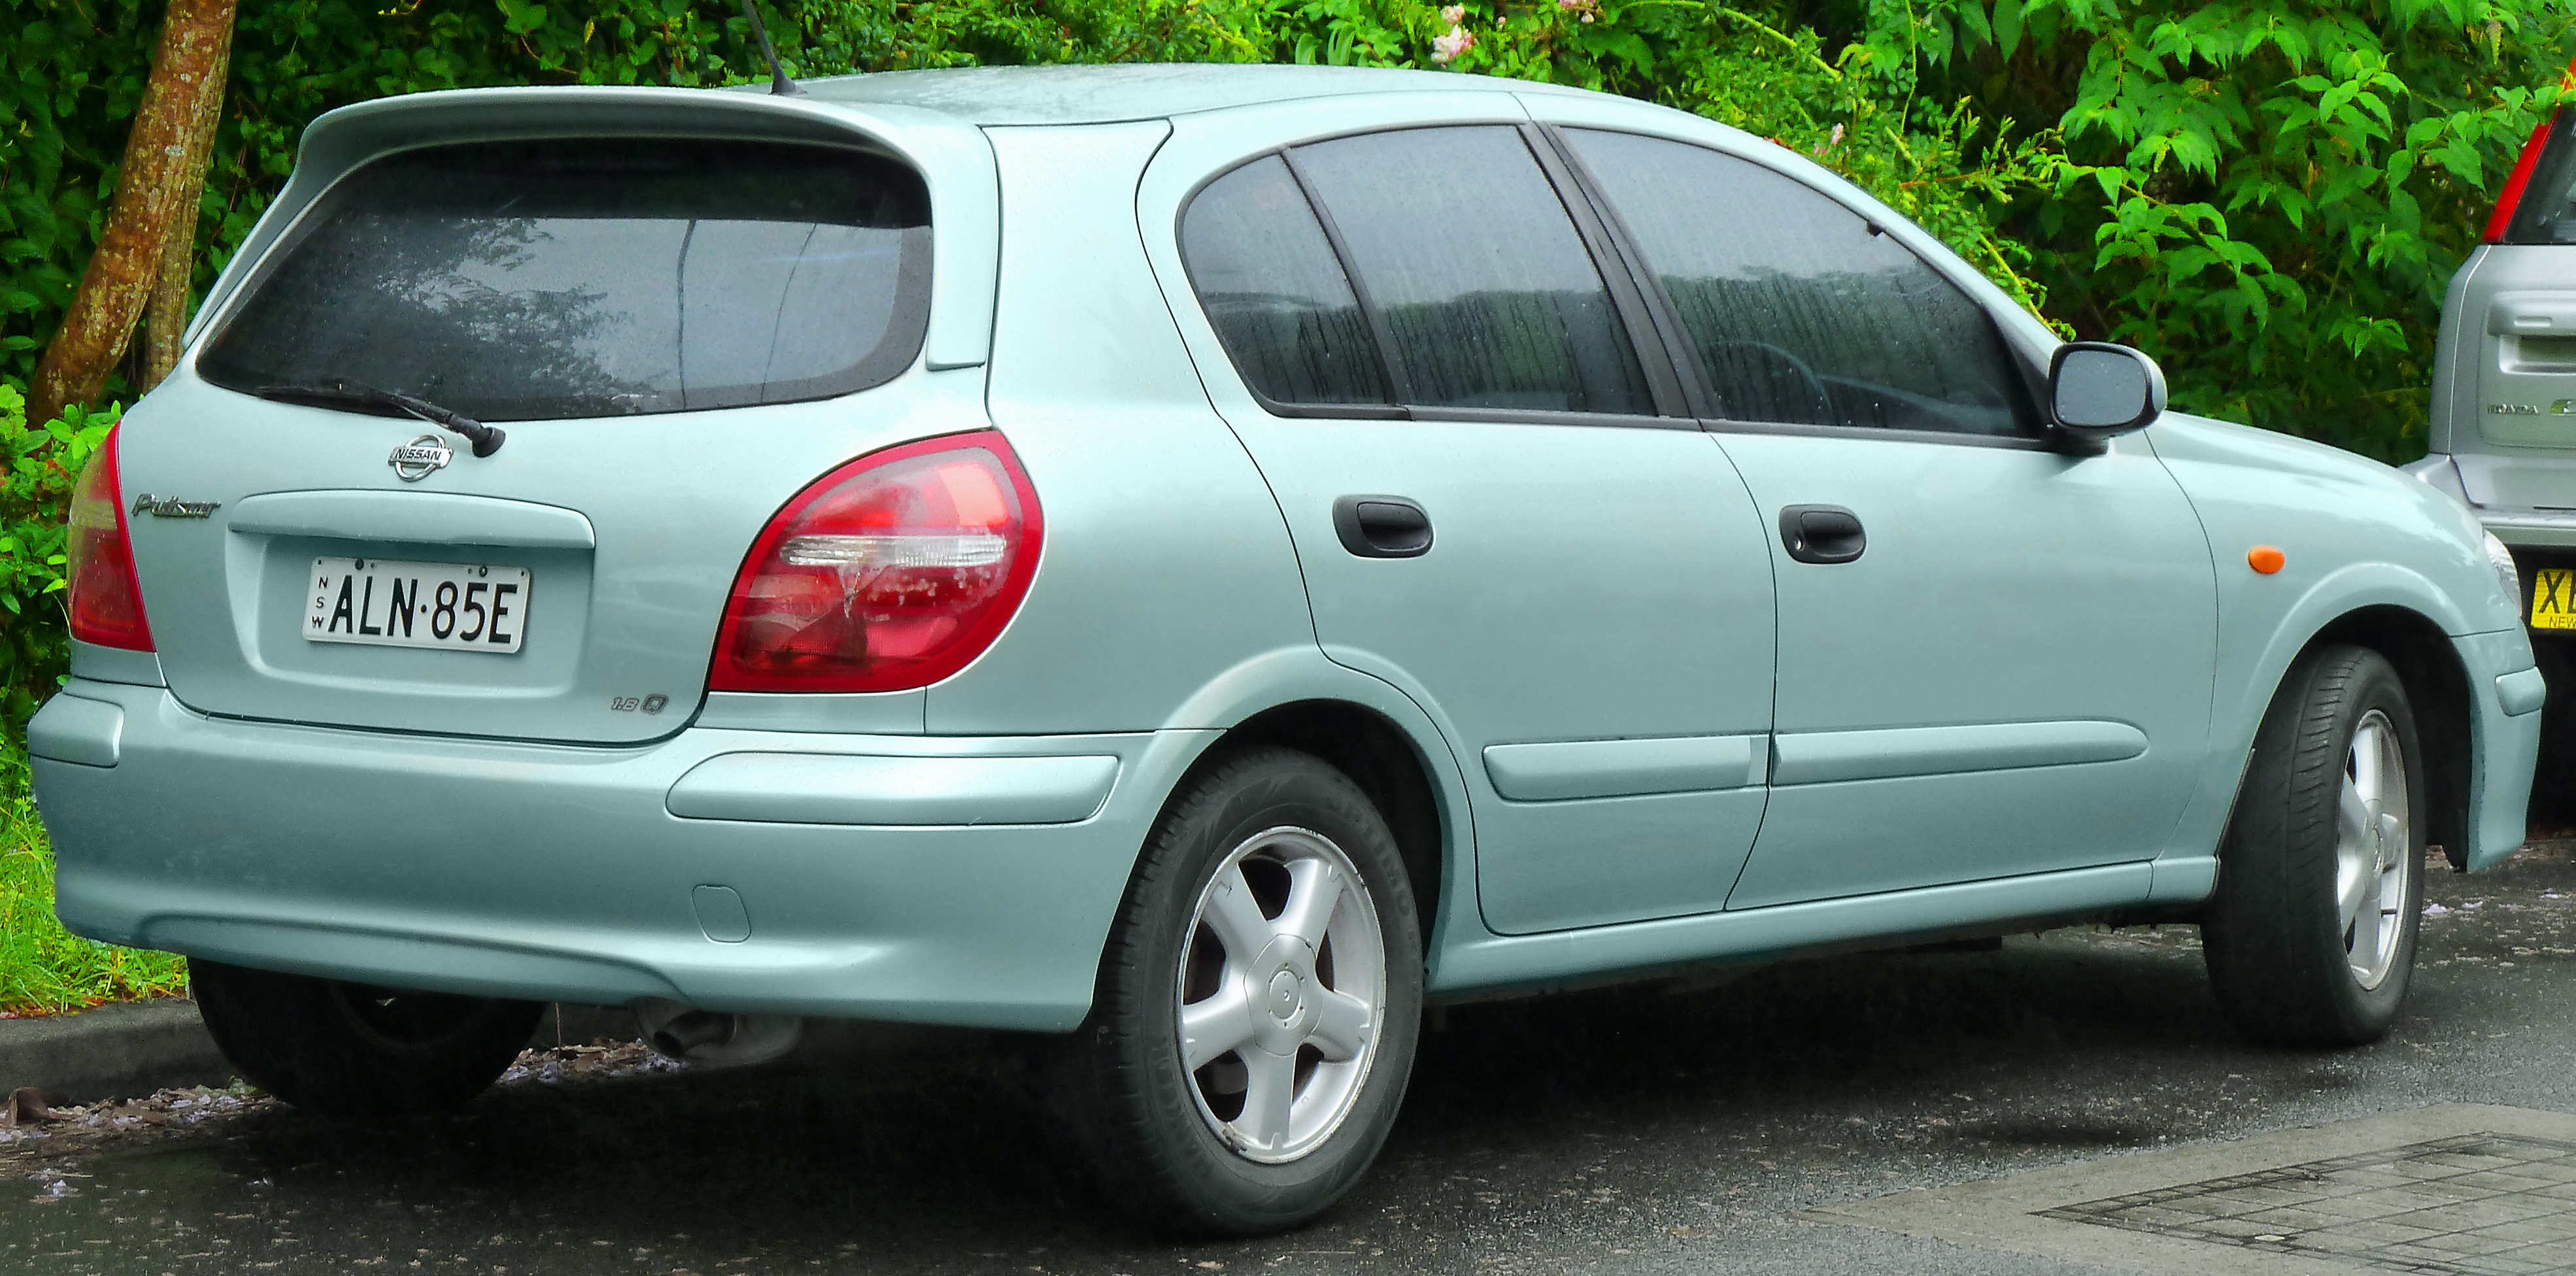 Nissan Certified Pre Owned >> File:2001-2002 Nissan Pulsar (N16) Q 5-door hatchback ...